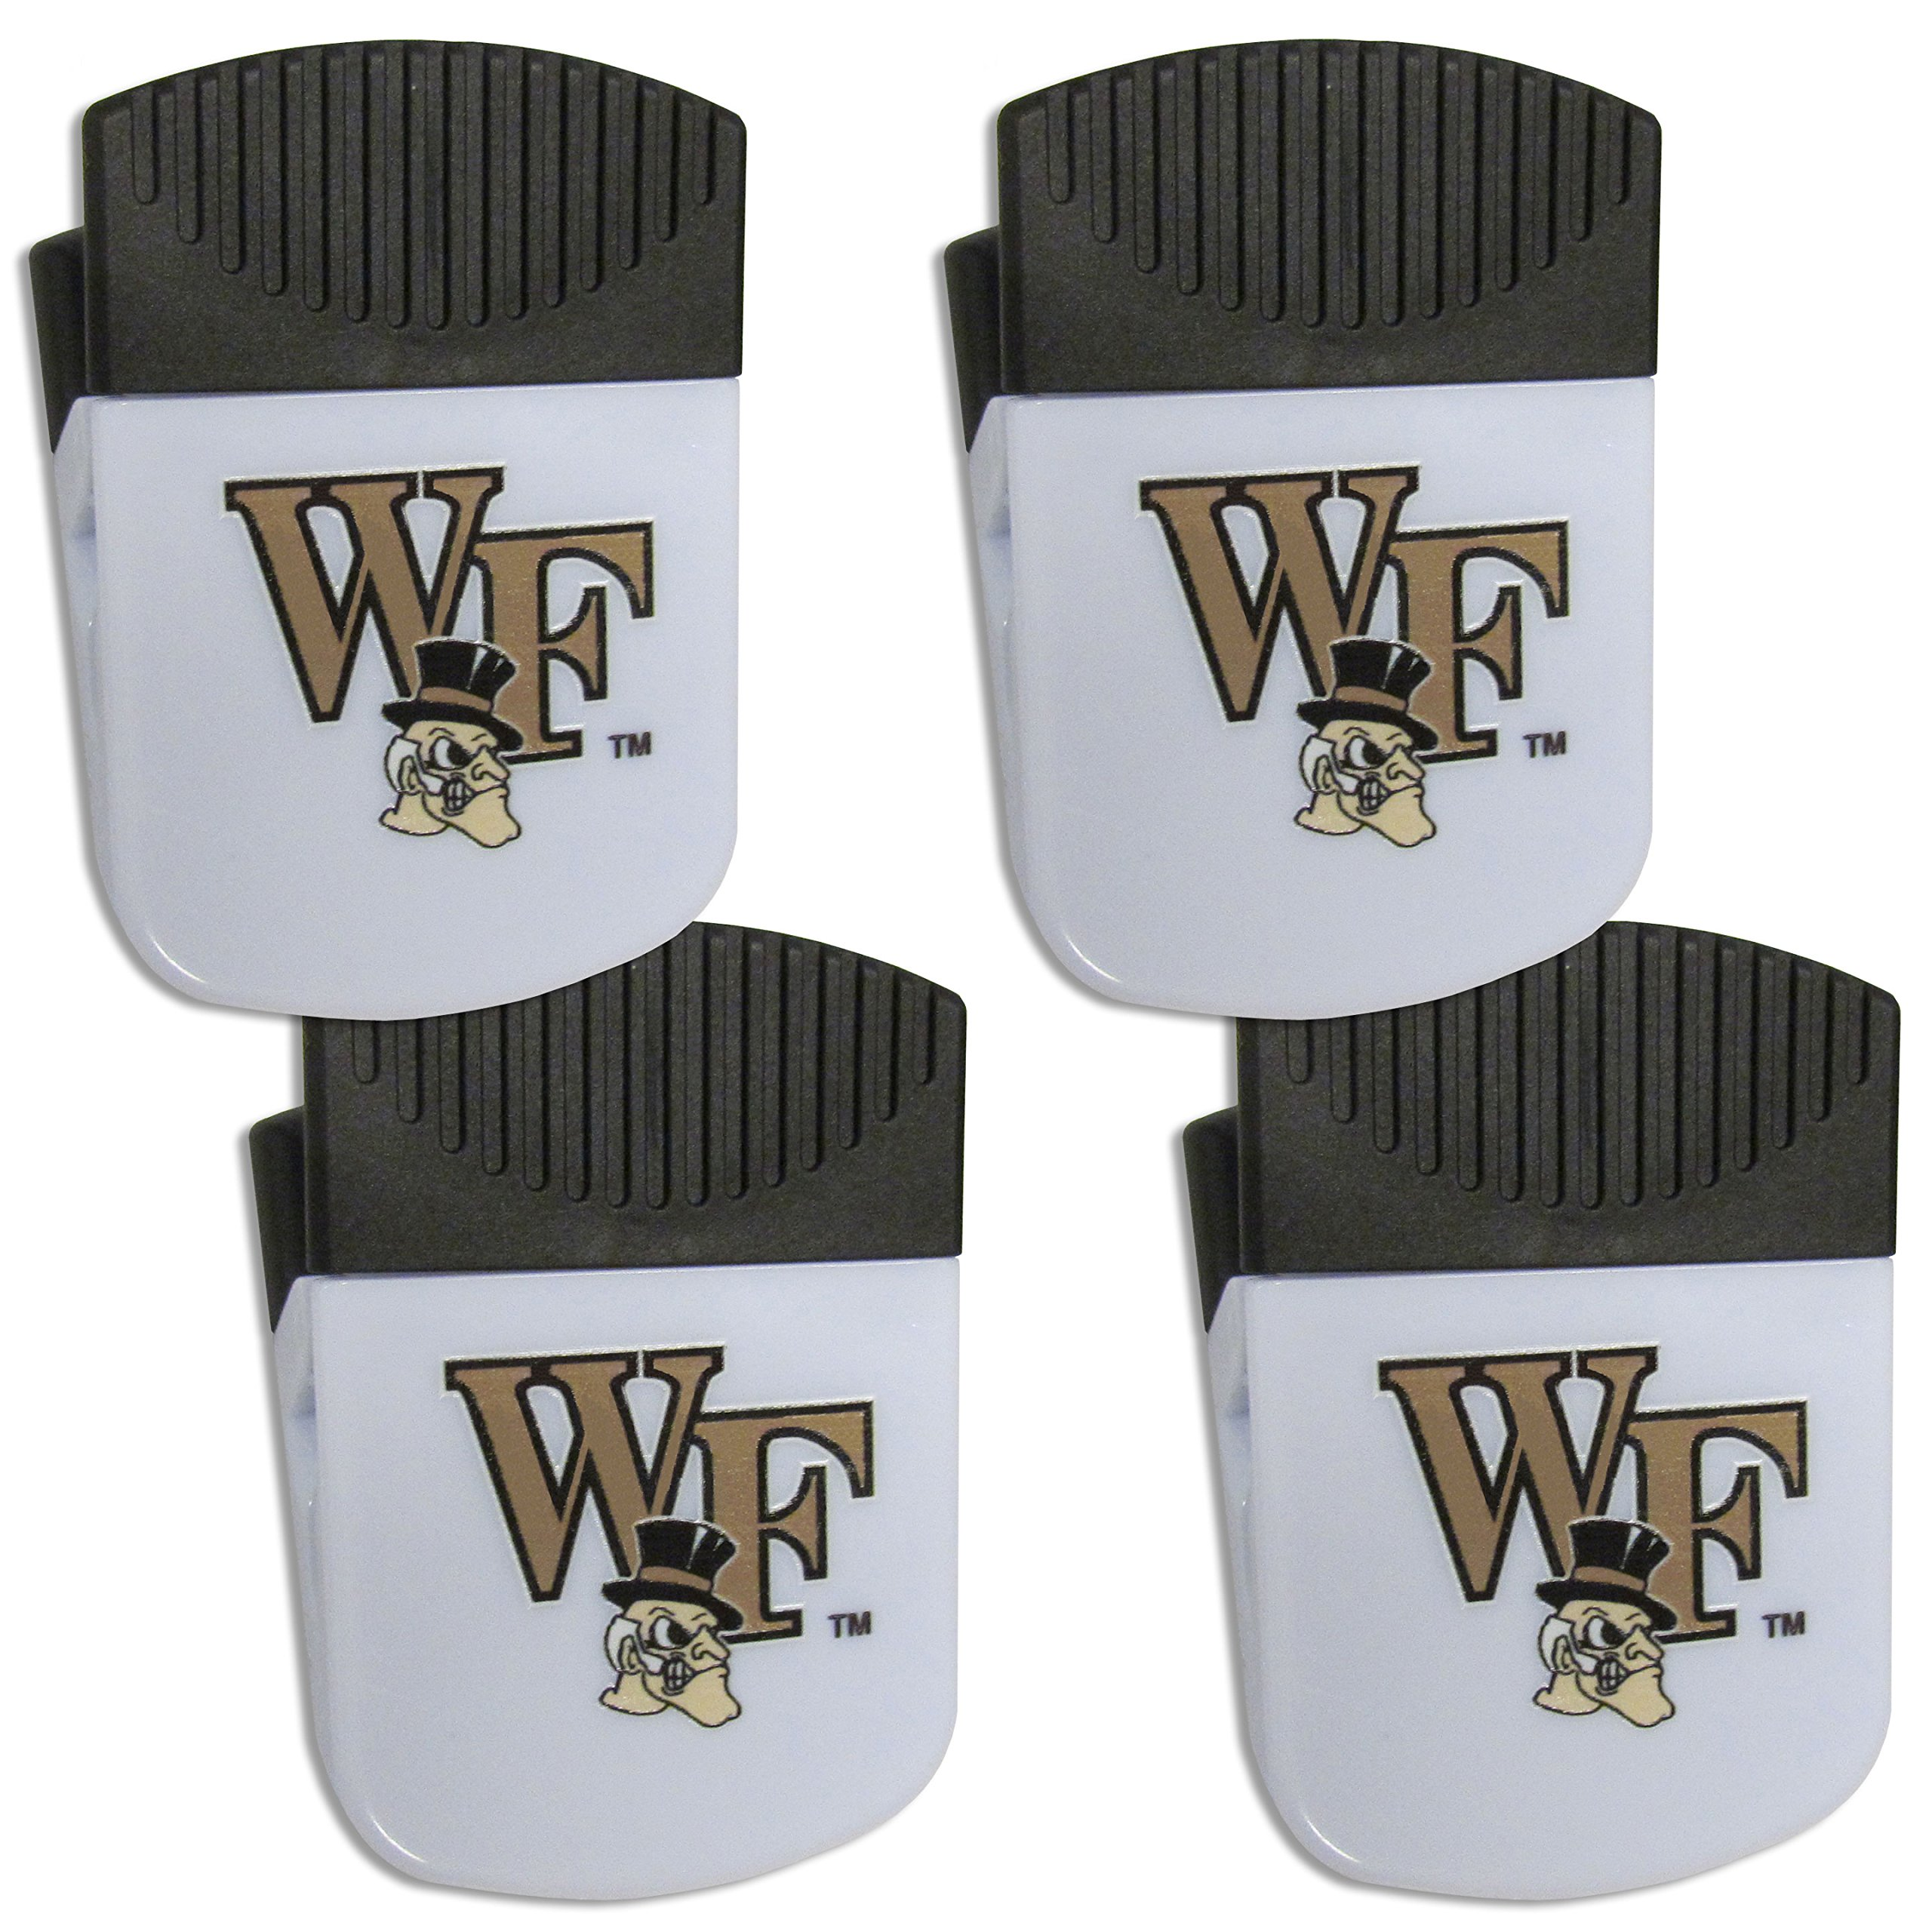 Siskiyou NCAA Wake Forest Demon Deacons Chip Clip Magnet with Bottle Opener, 4 Pack